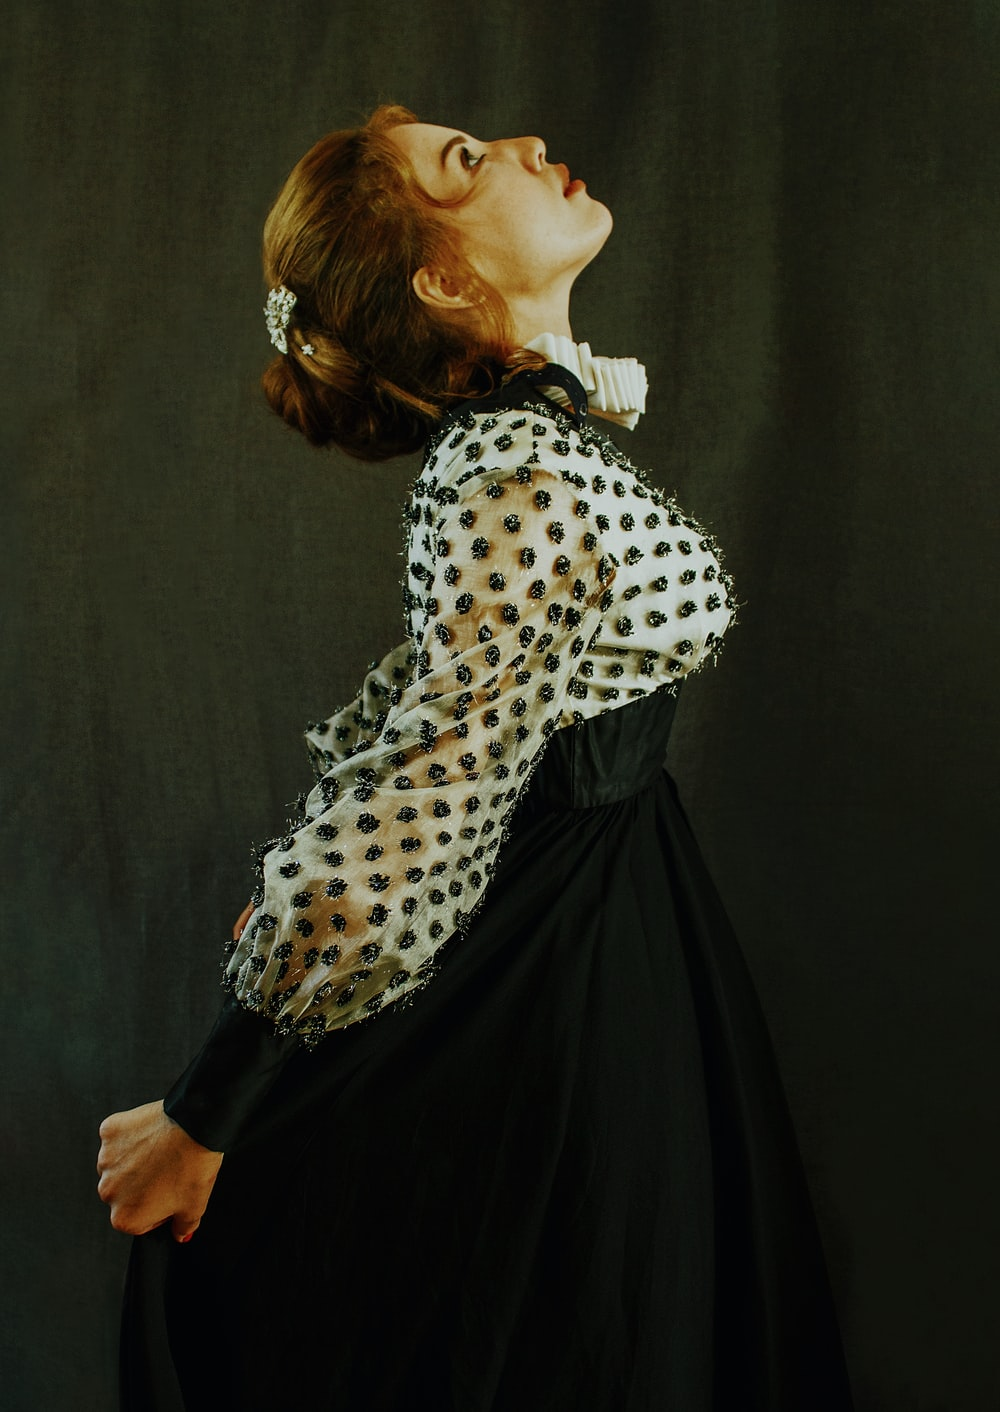 woman in white and black polka dot long sleeve shirt and black skirt